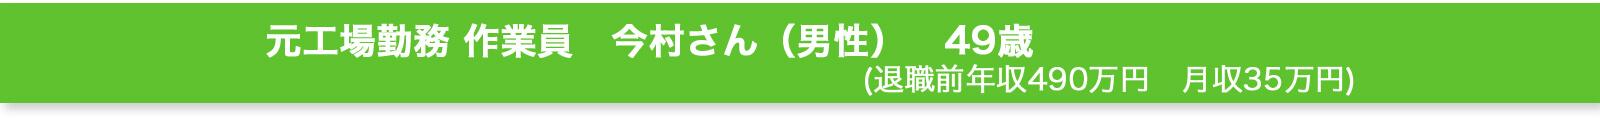 元工場勤務 作業員 今村さん(男性) 49歳